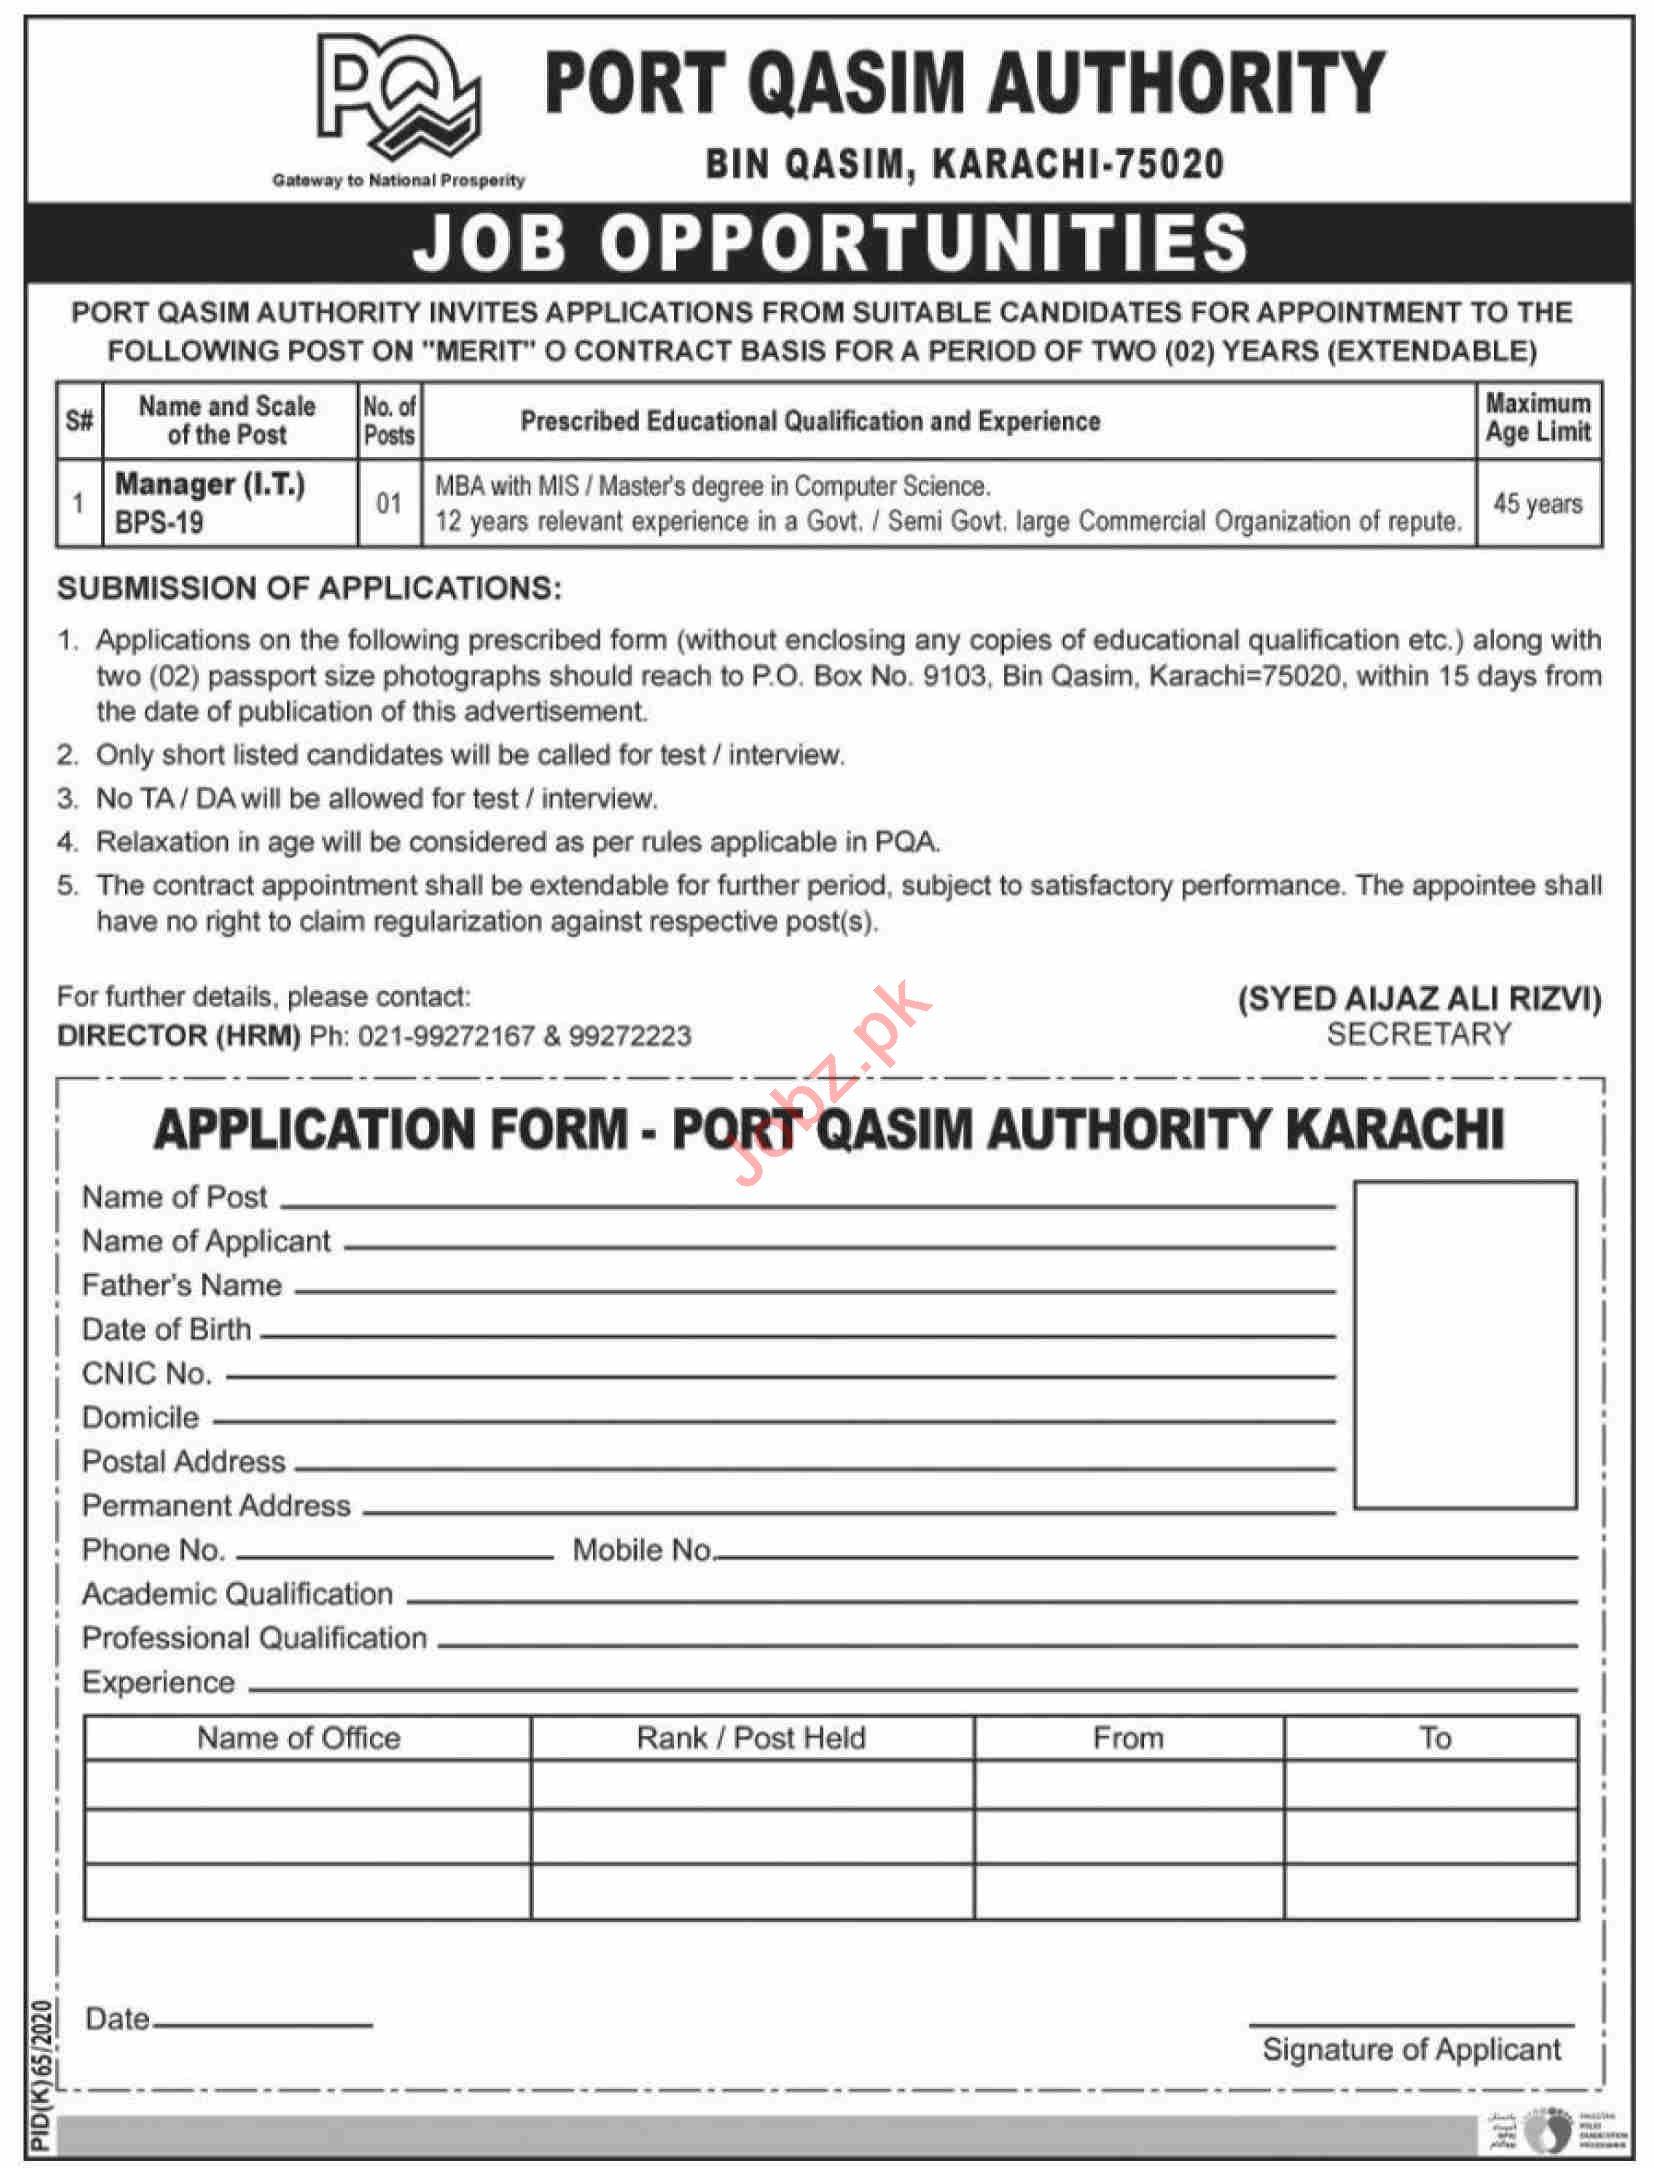 Port Qasim Authority PQA Karachi Jobs 2020 for Manager IT